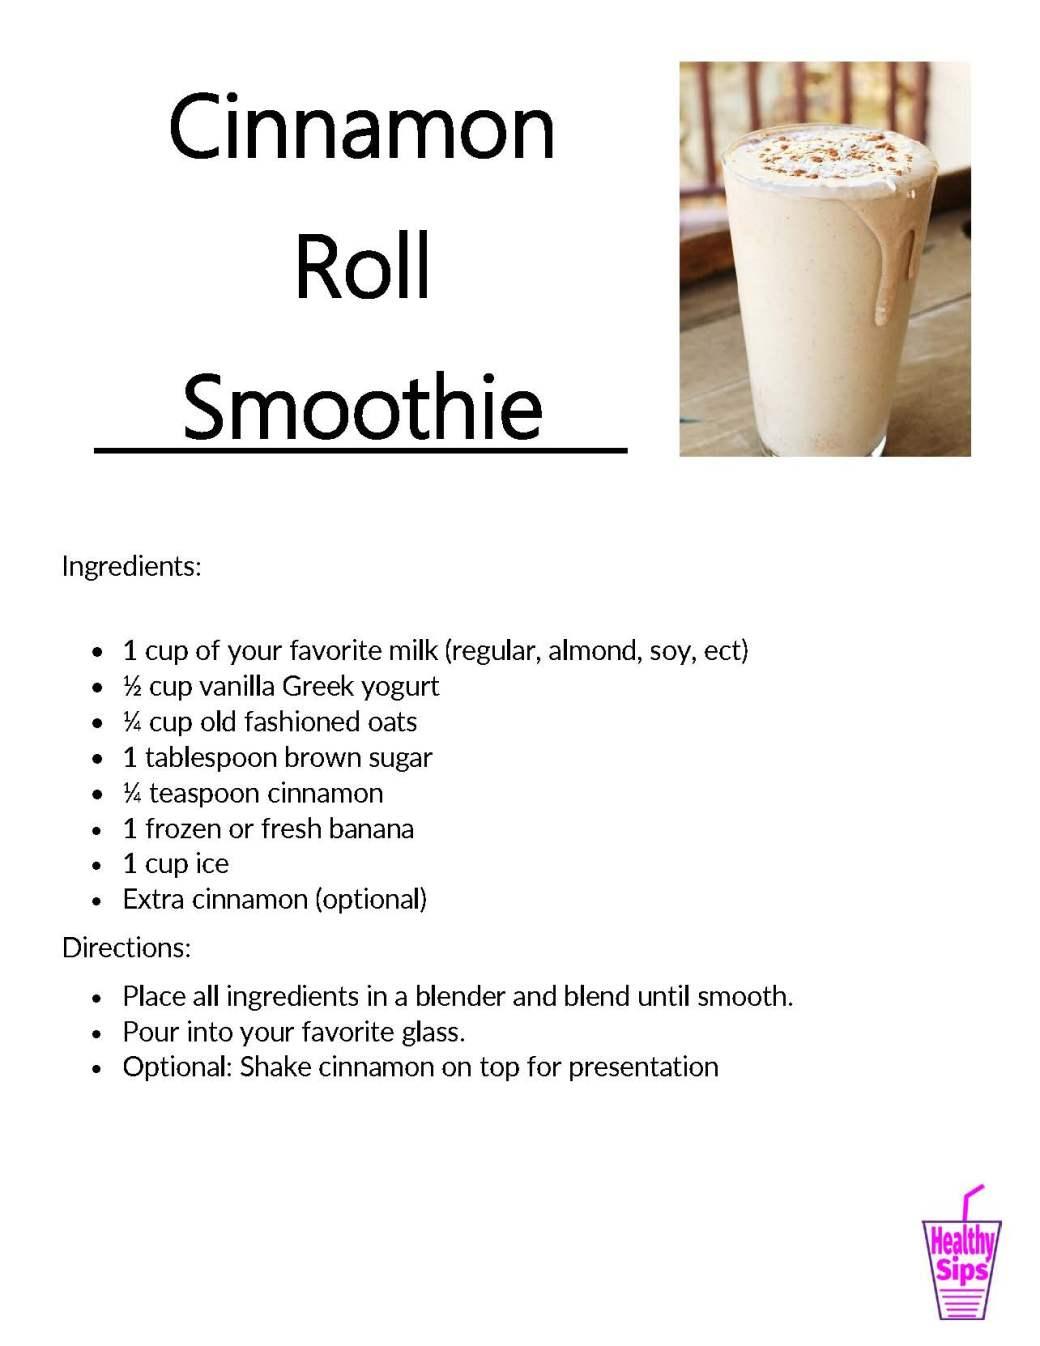 Cinnamon Roll Smoothie